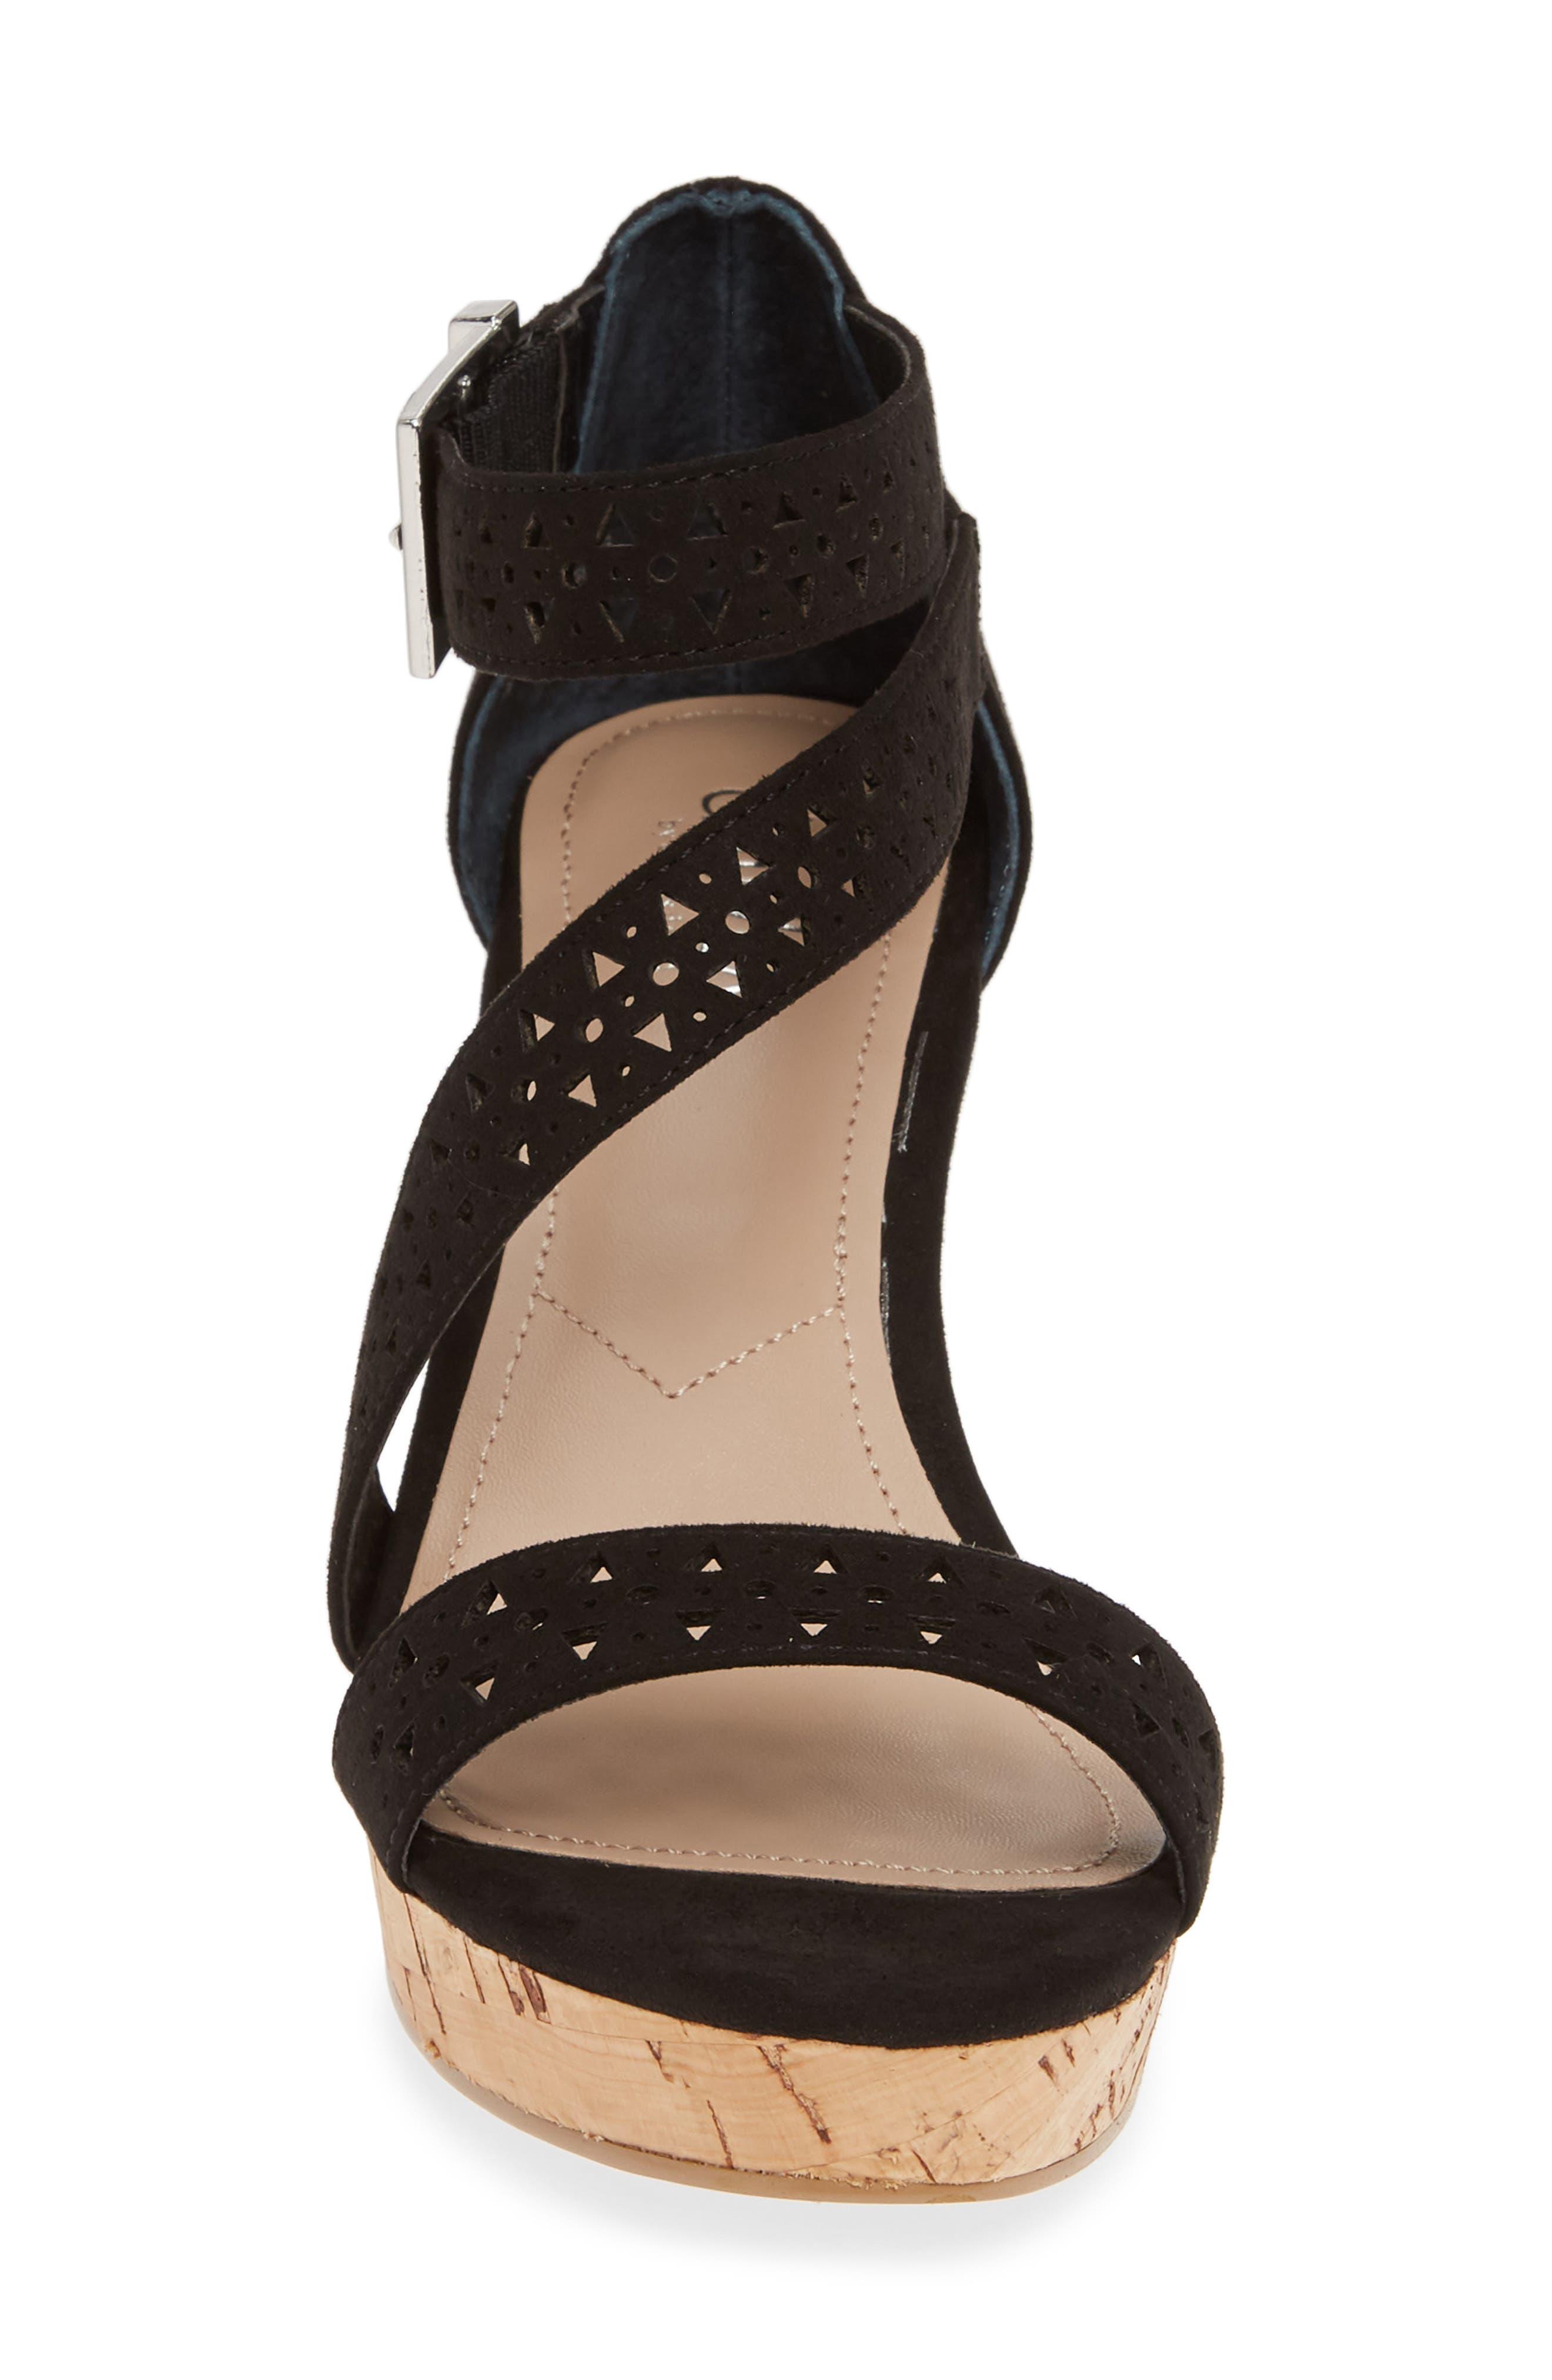 Landon Perforated Wedge Sandal,                             Alternate thumbnail 4, color,                             BLACK FABRIC